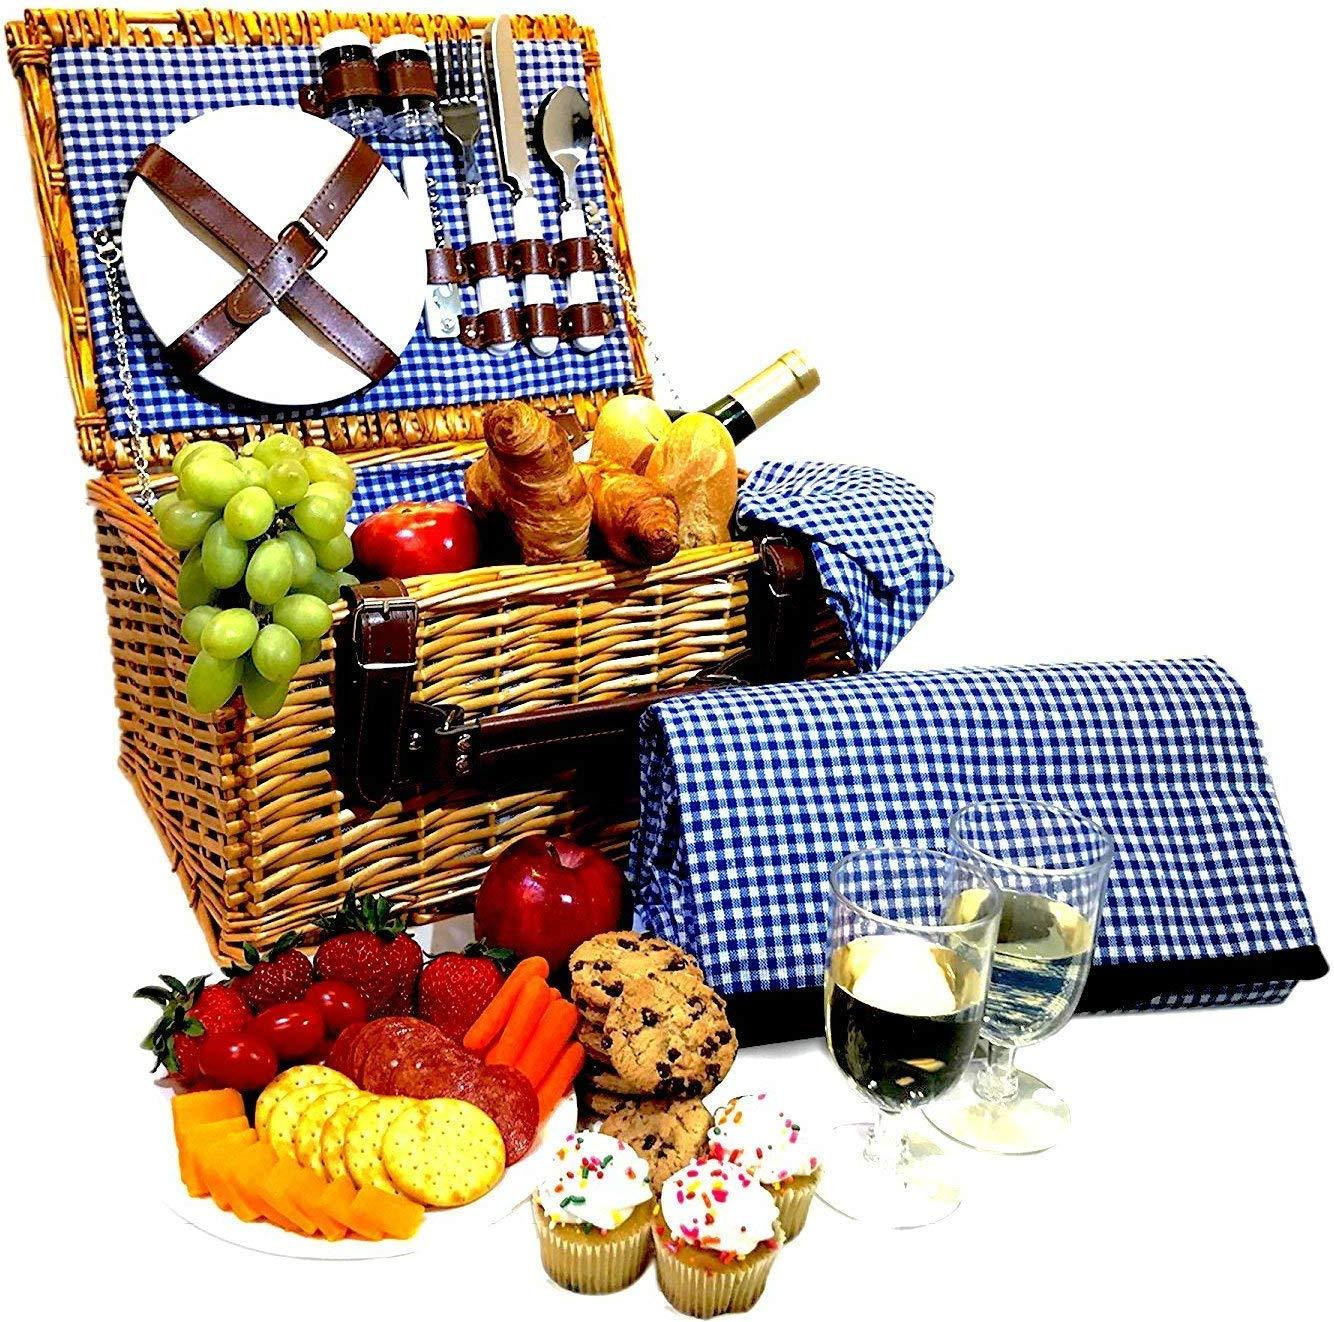 Picnic Basket Set 2 Person Hamper Set Waterproof Blanket Ceramic Plates Metal Flatware Wine Glasses S/P Shakers Bottle Opener Blue Checked Pattern Lining